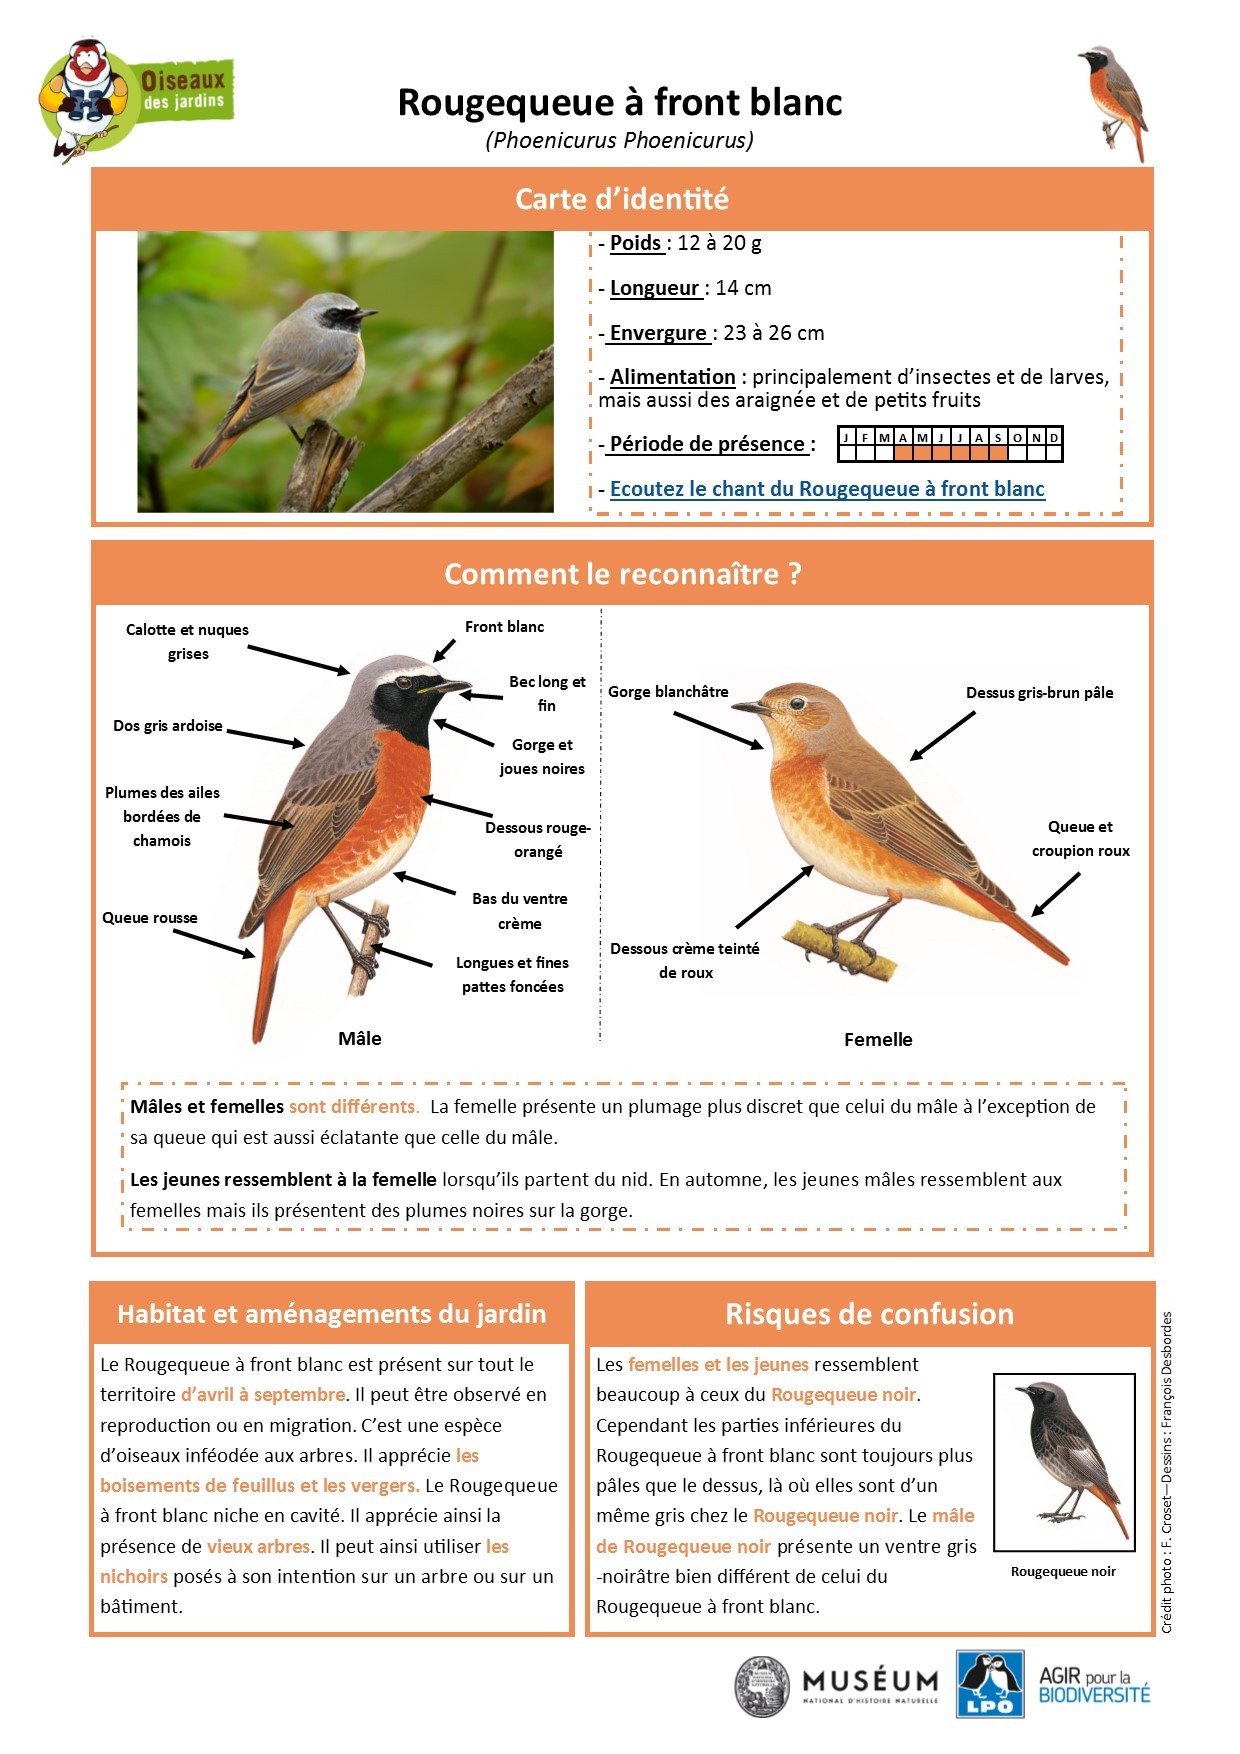 https://cdnfiles2.biolovision.net/www.oiseauxdesjardins.fr/userfiles/Fichesespces/FicheespceRQFB.pdf